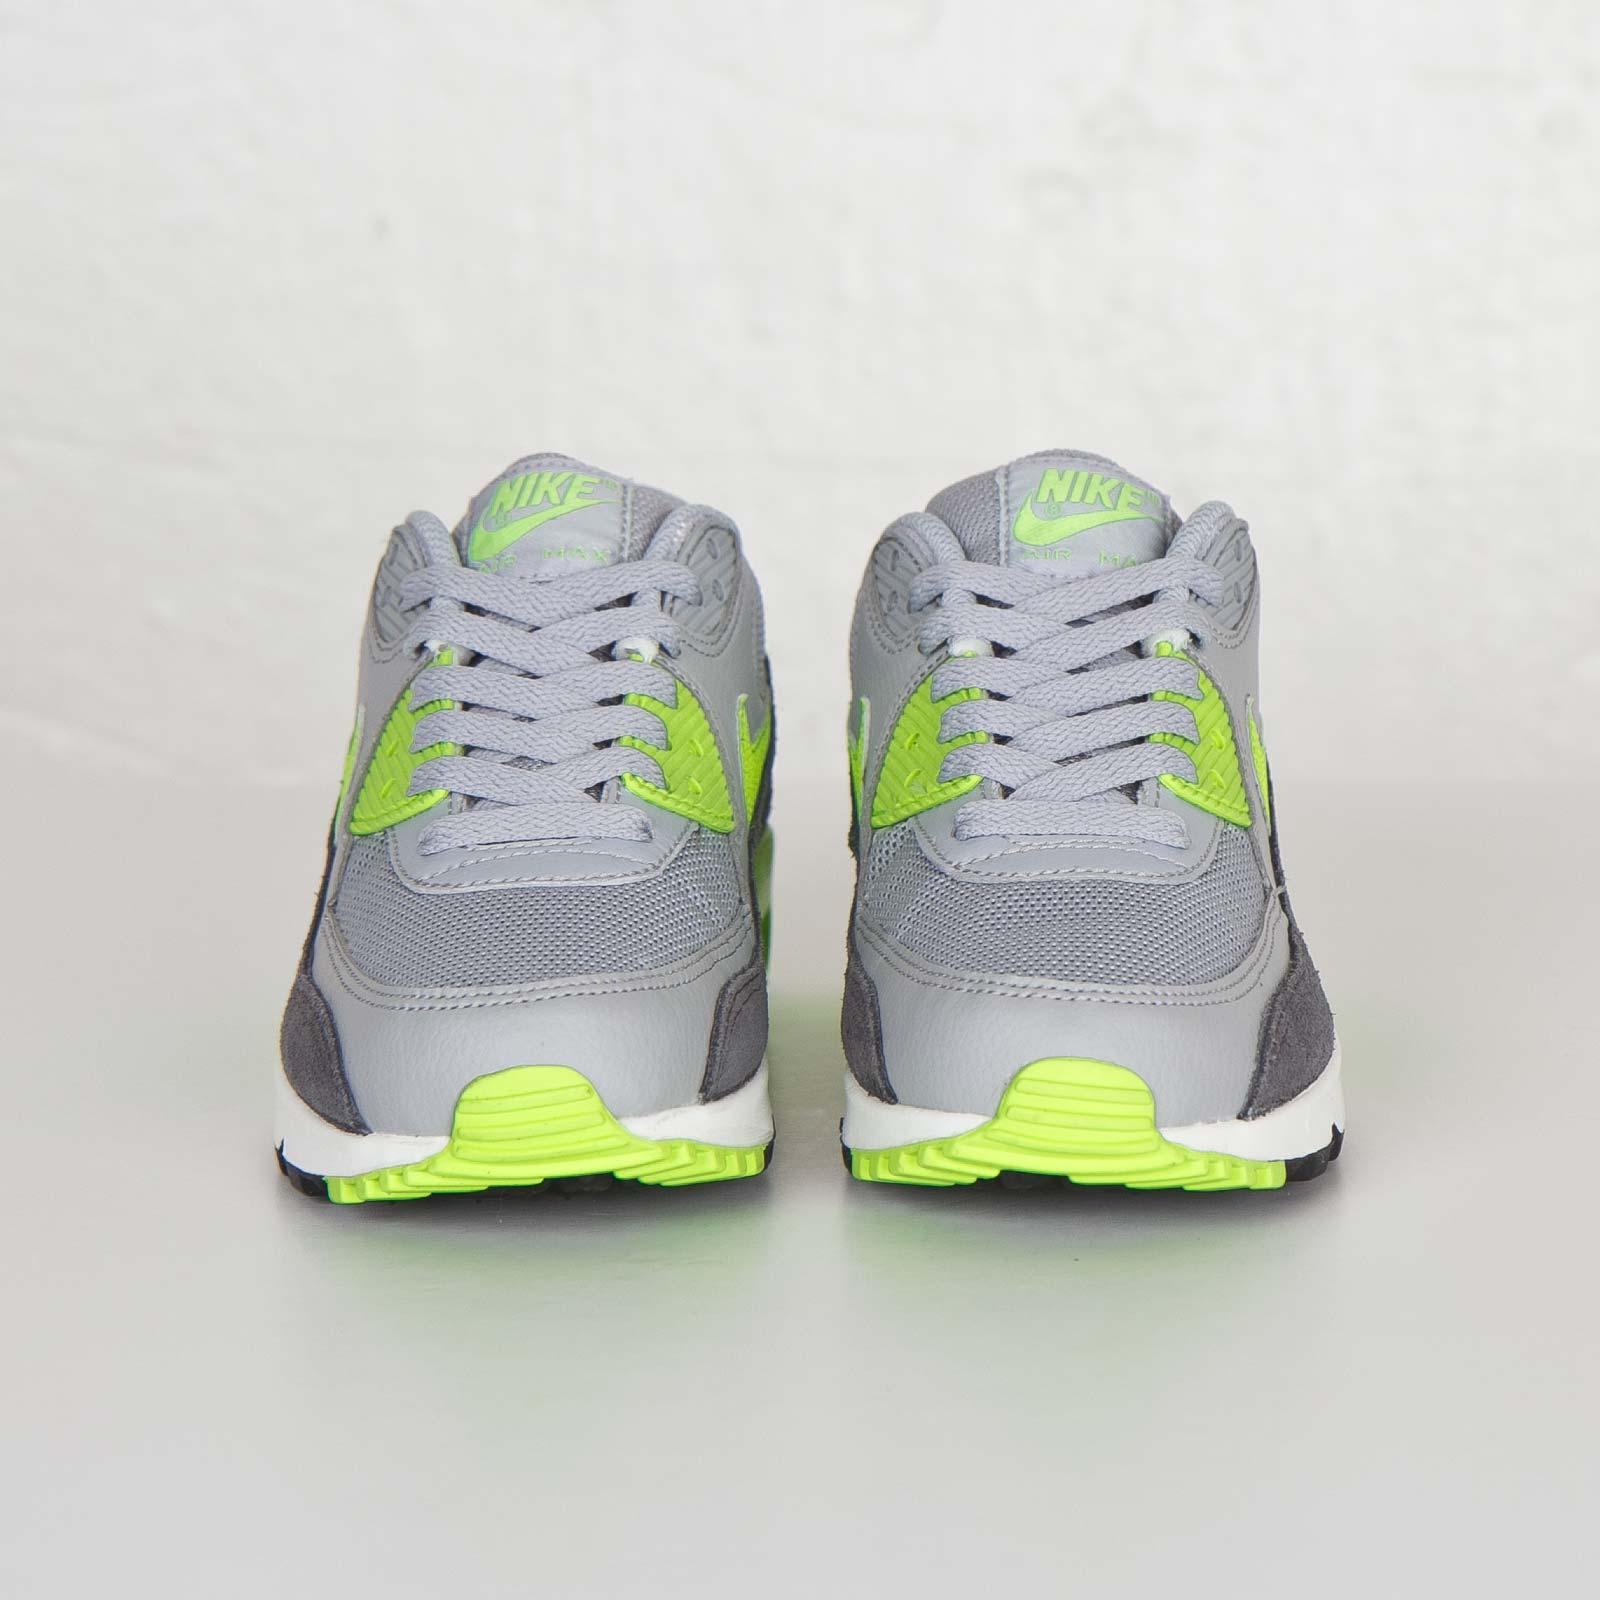 Nike Wmns Air Max 90 Essential 616730 022 Sneakersnstuff